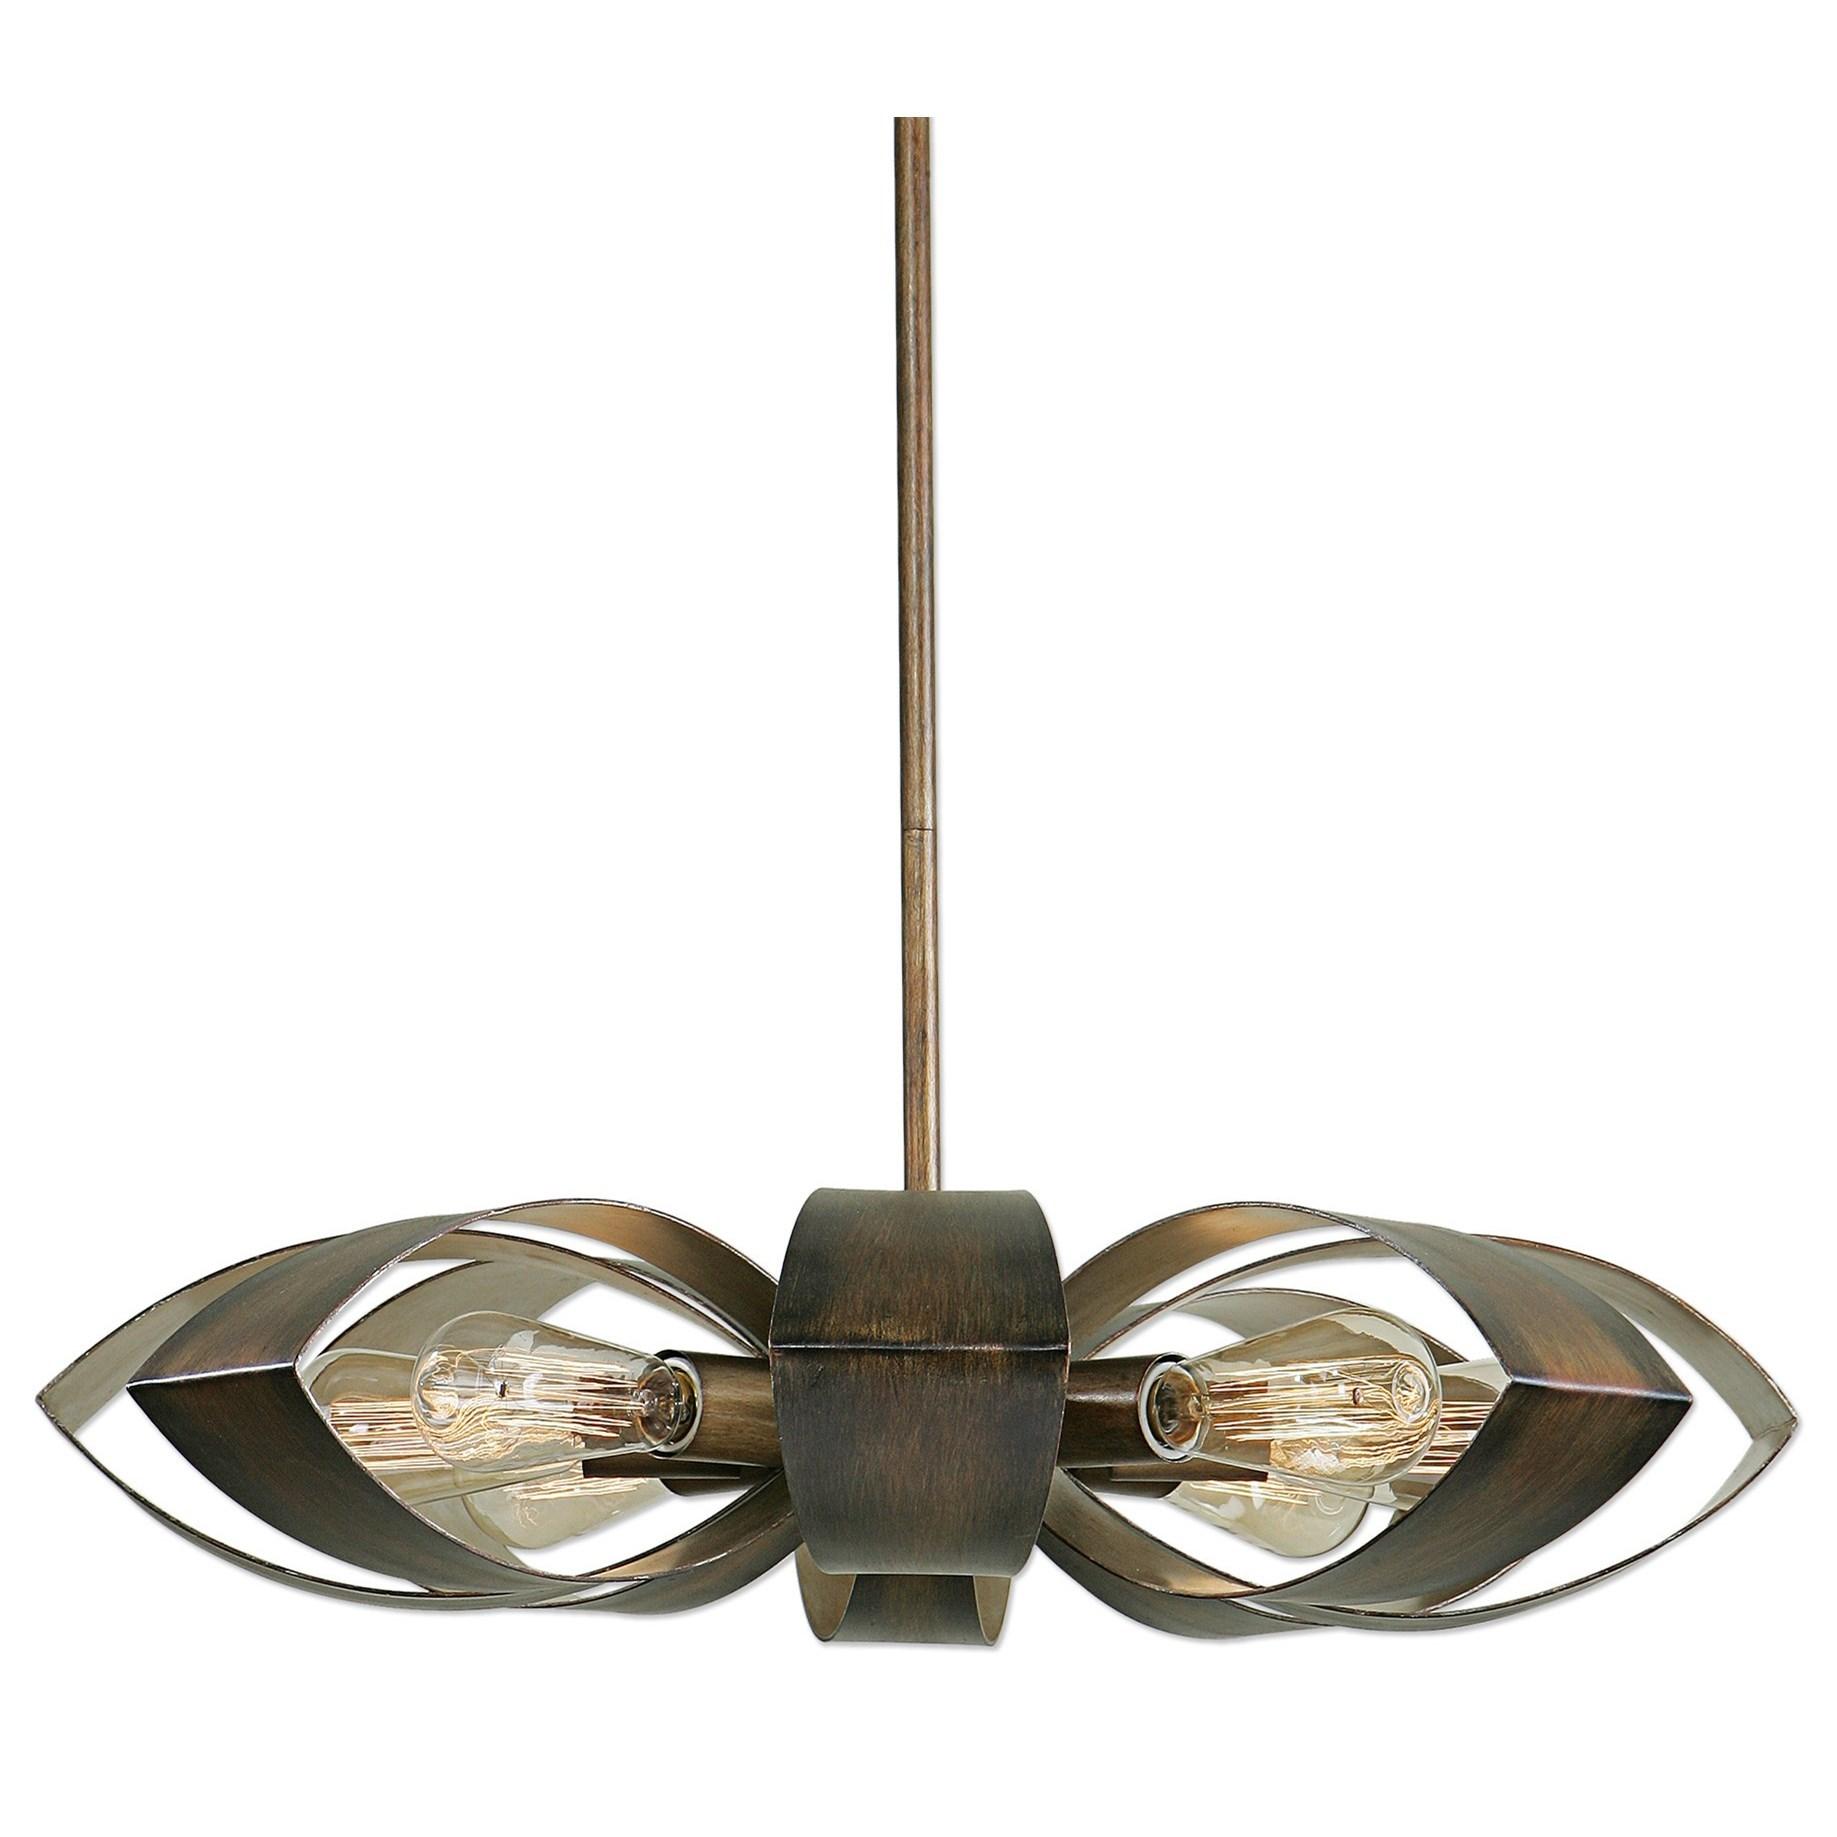 Uttermost Lighting Fixtures Daisy 8 Light Industrial Pendant - Item Number: 21284